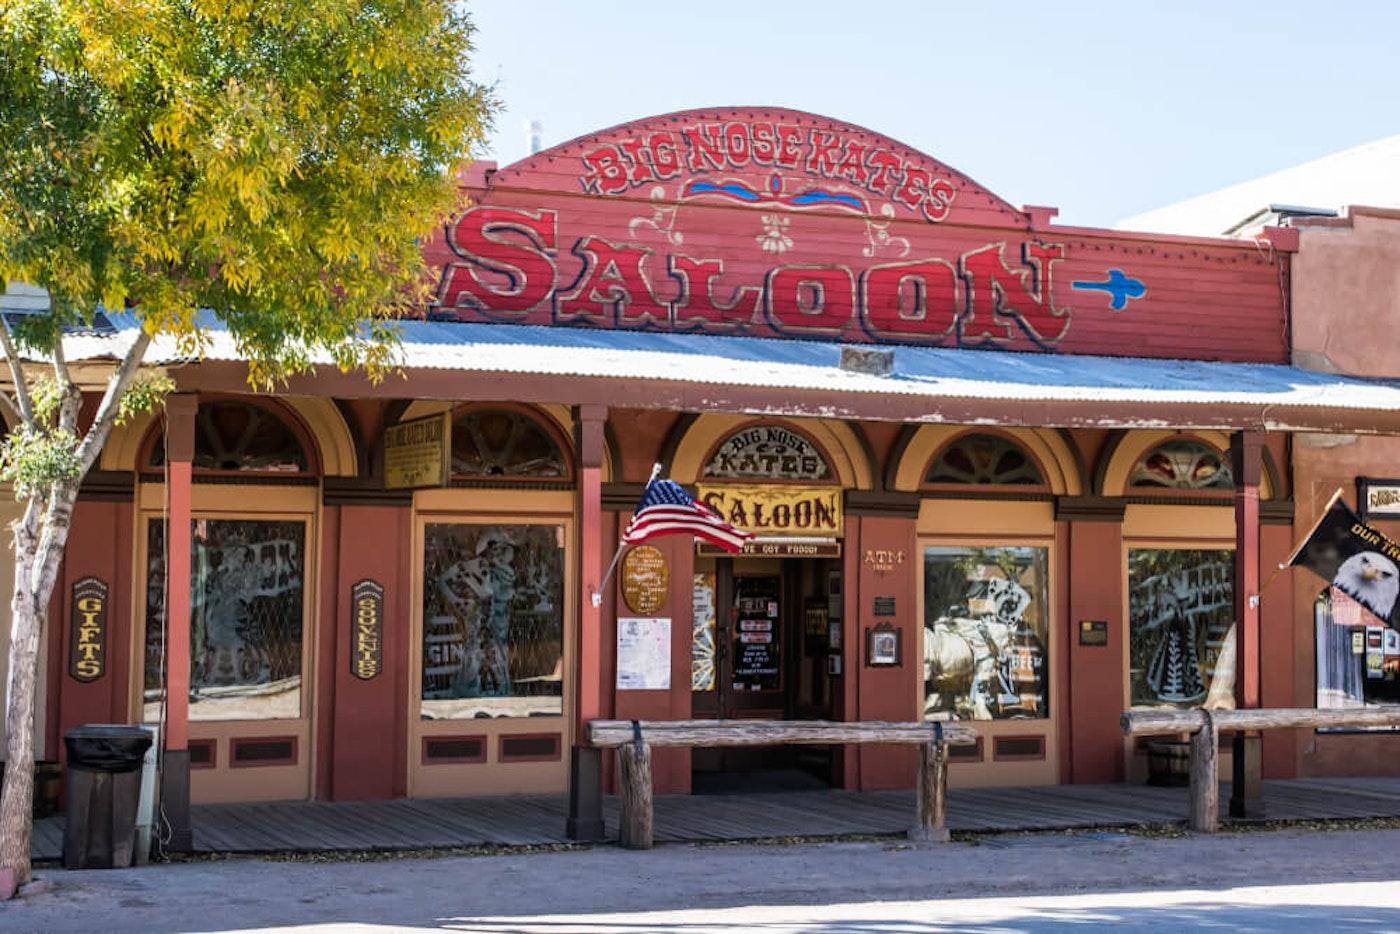 Big Nose Kate's Saloon in Tombstone, Arizona